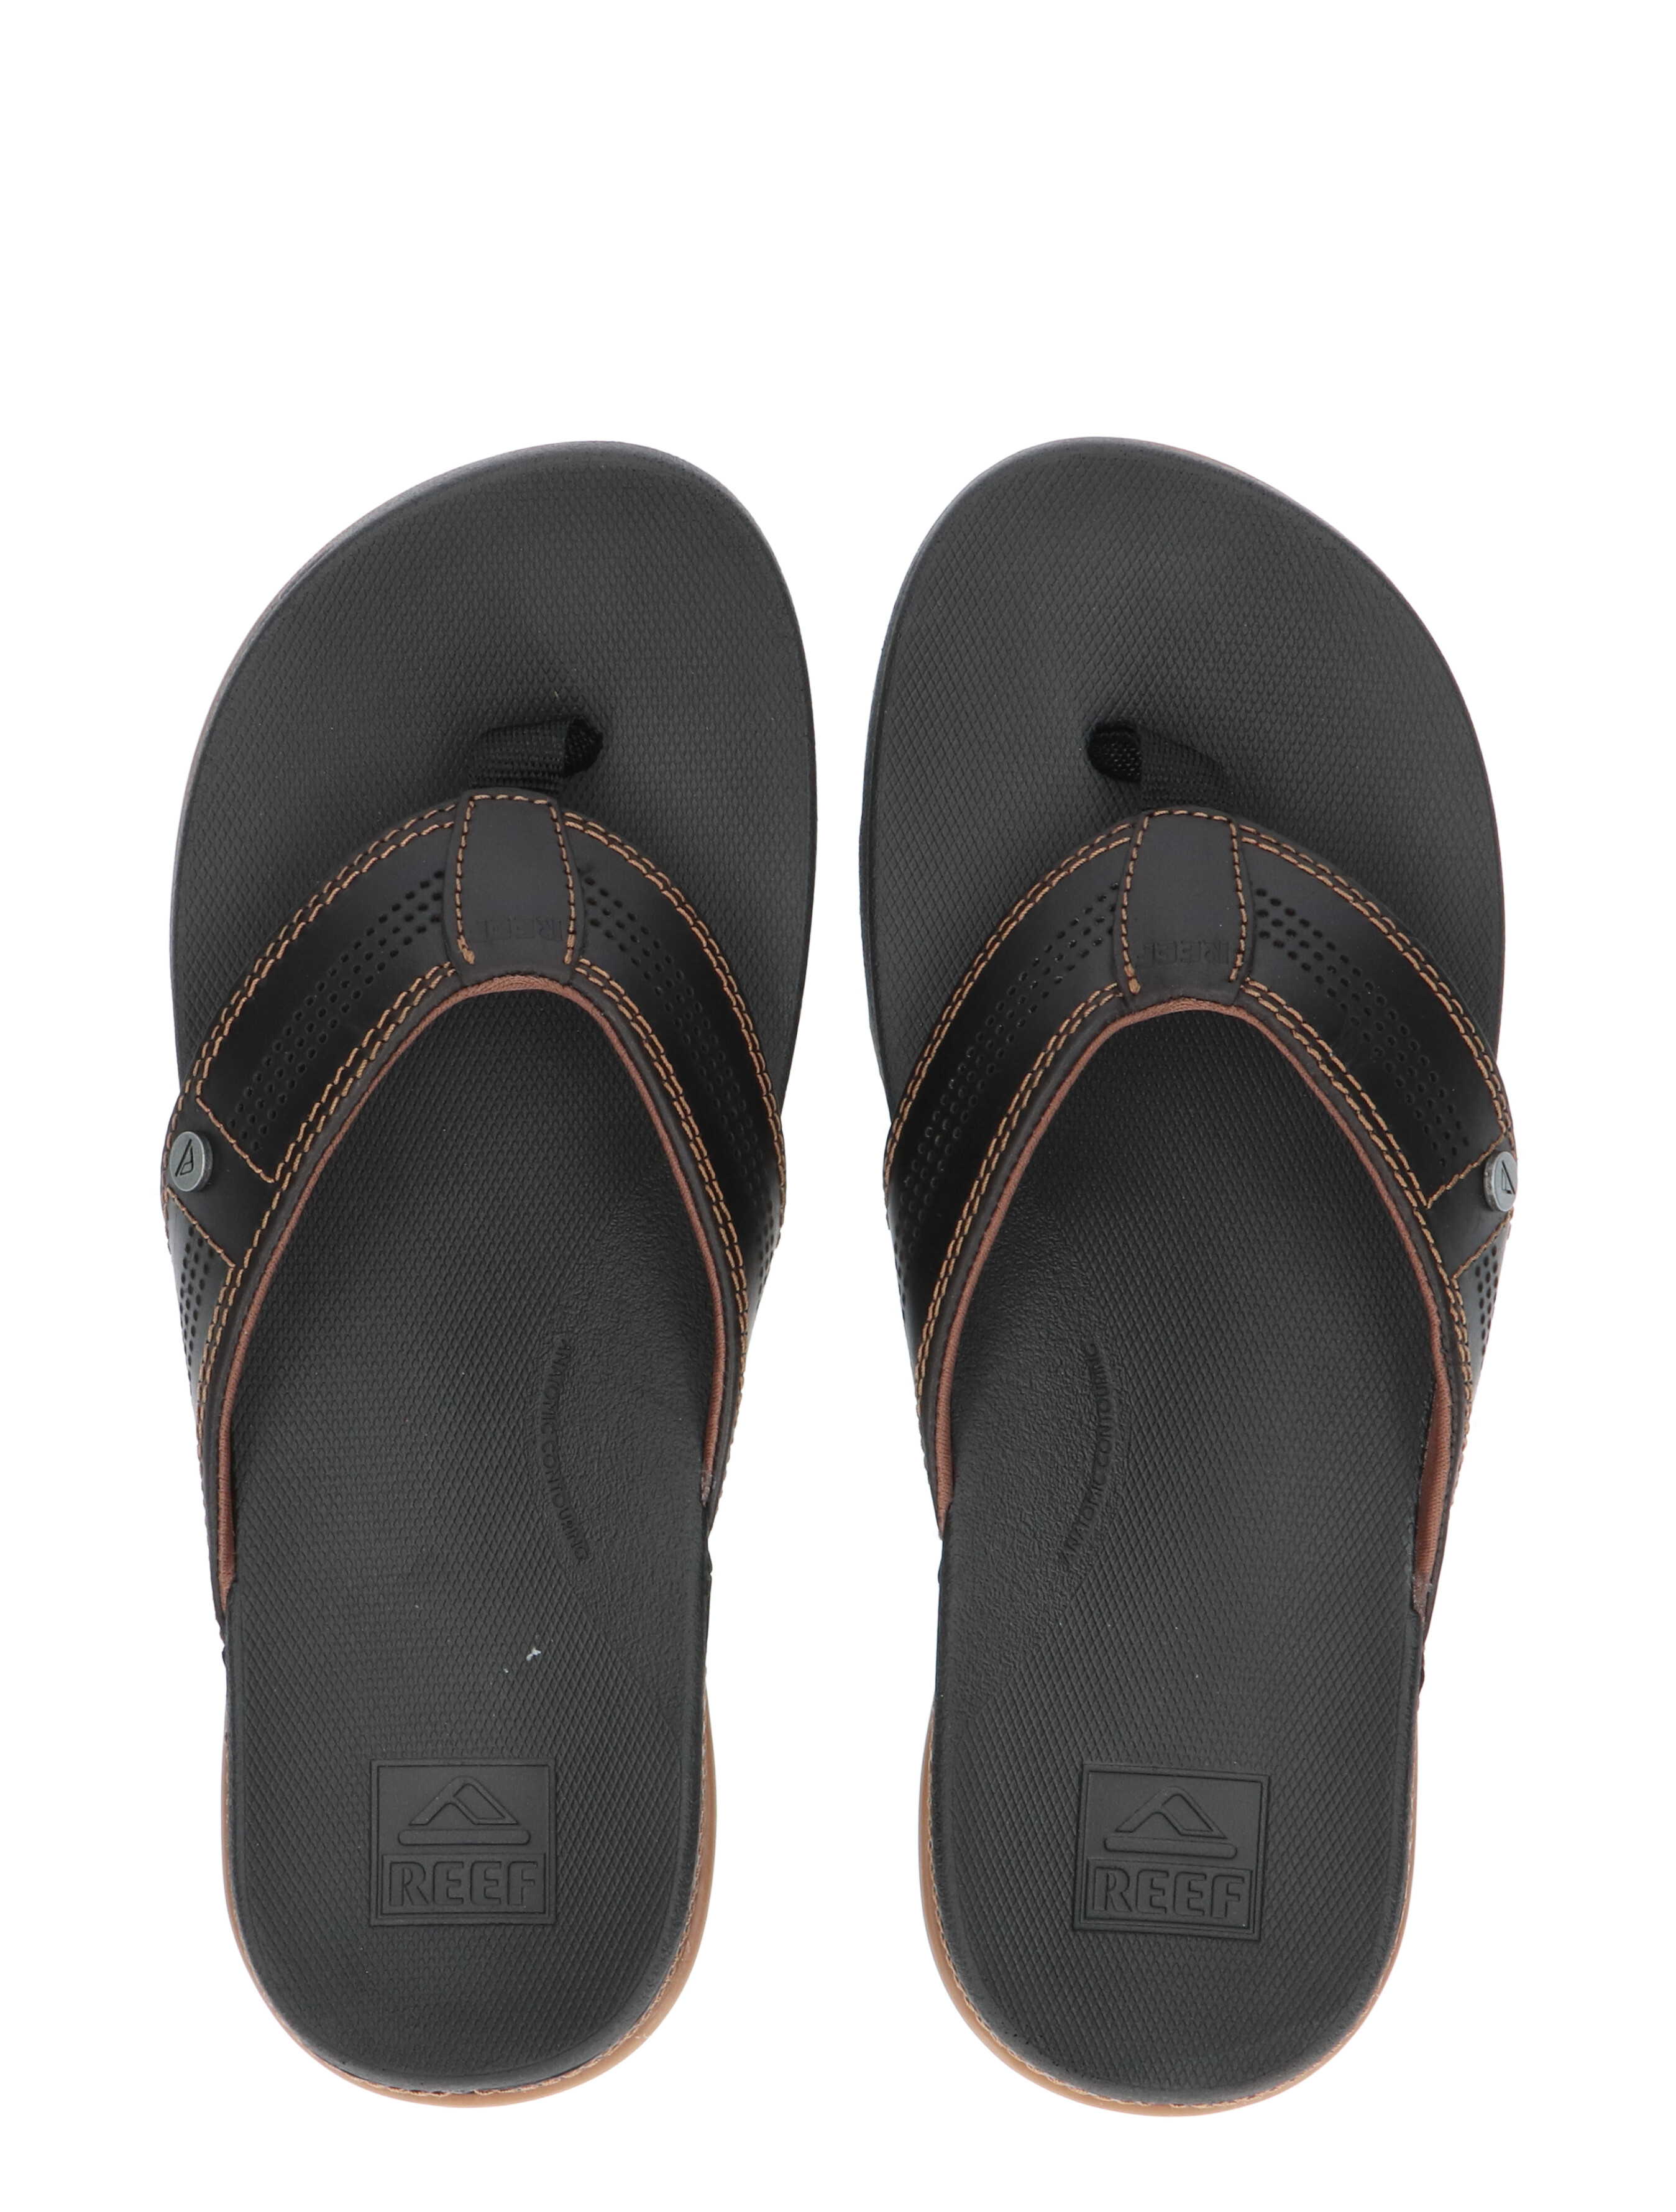 Reef Cushion Bounce Black Slippers